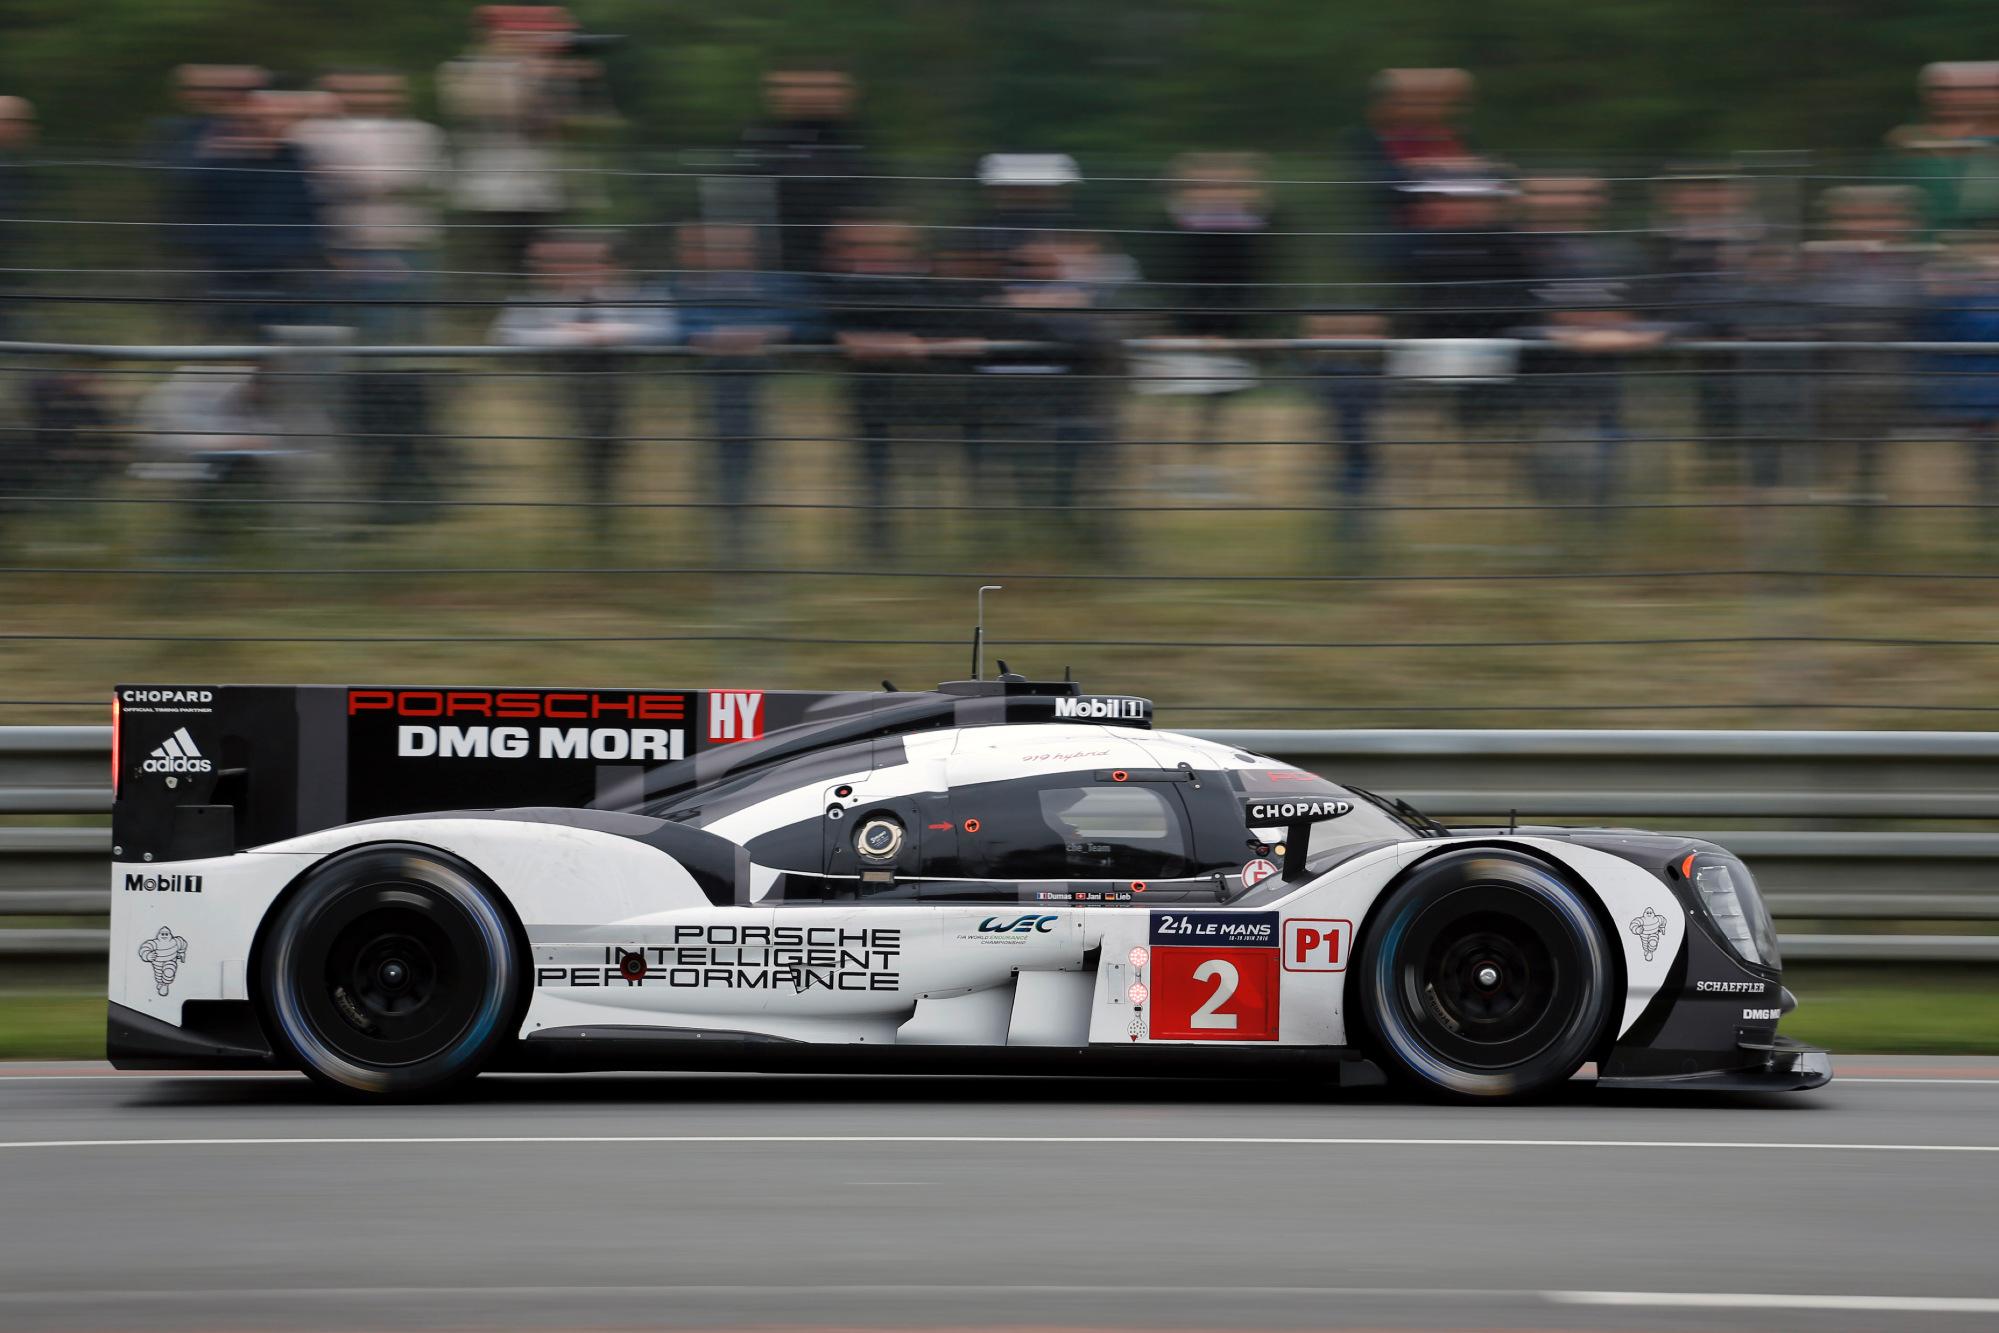 2016 Le Mans, Porsche 919H